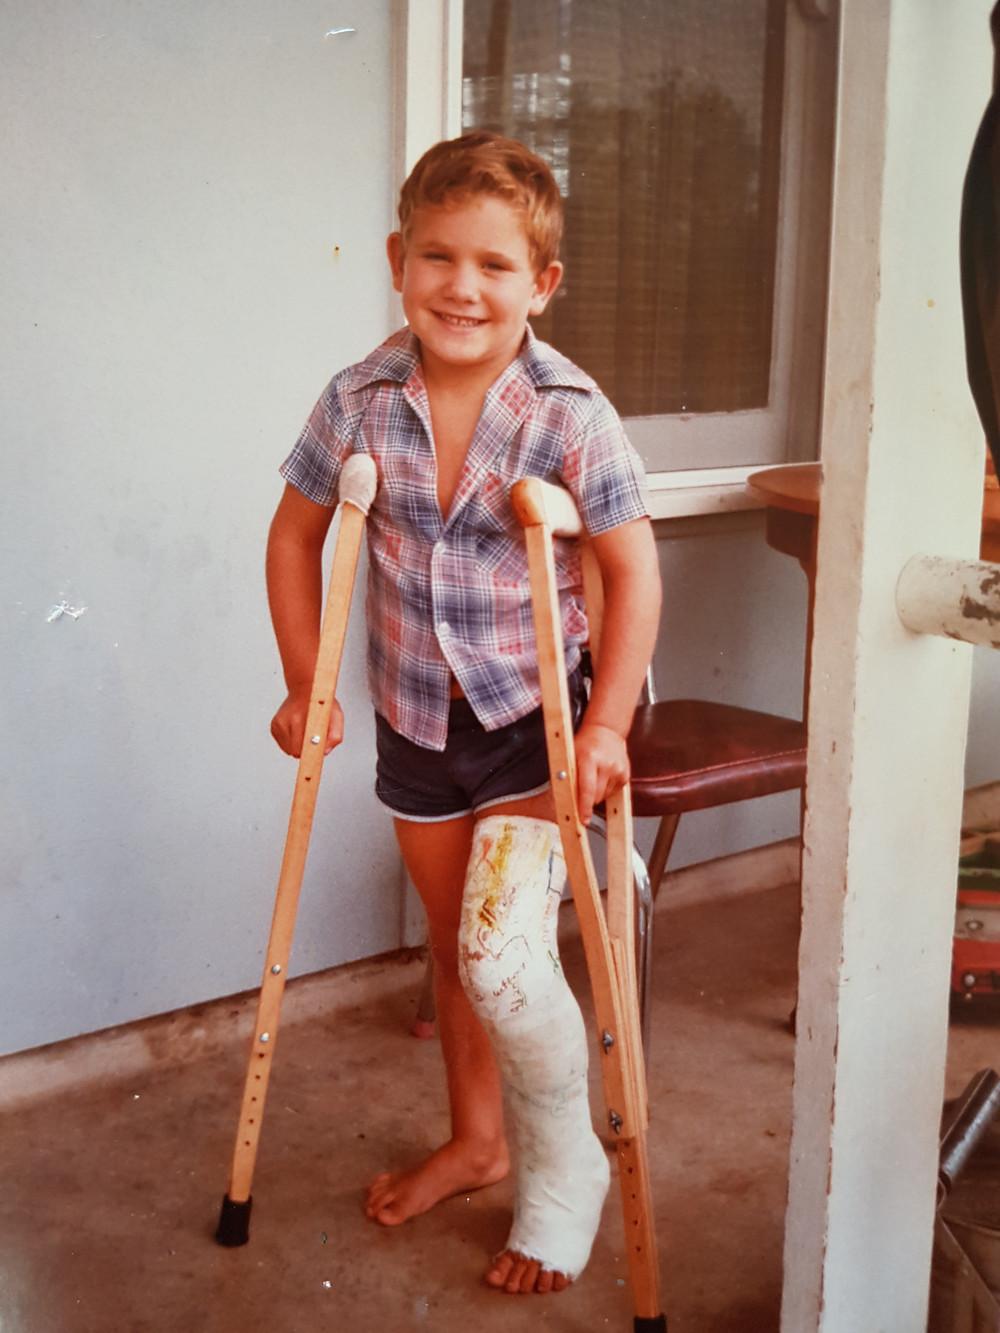 #kidsinjured #brokenleg #kidstrauma #davejohnson